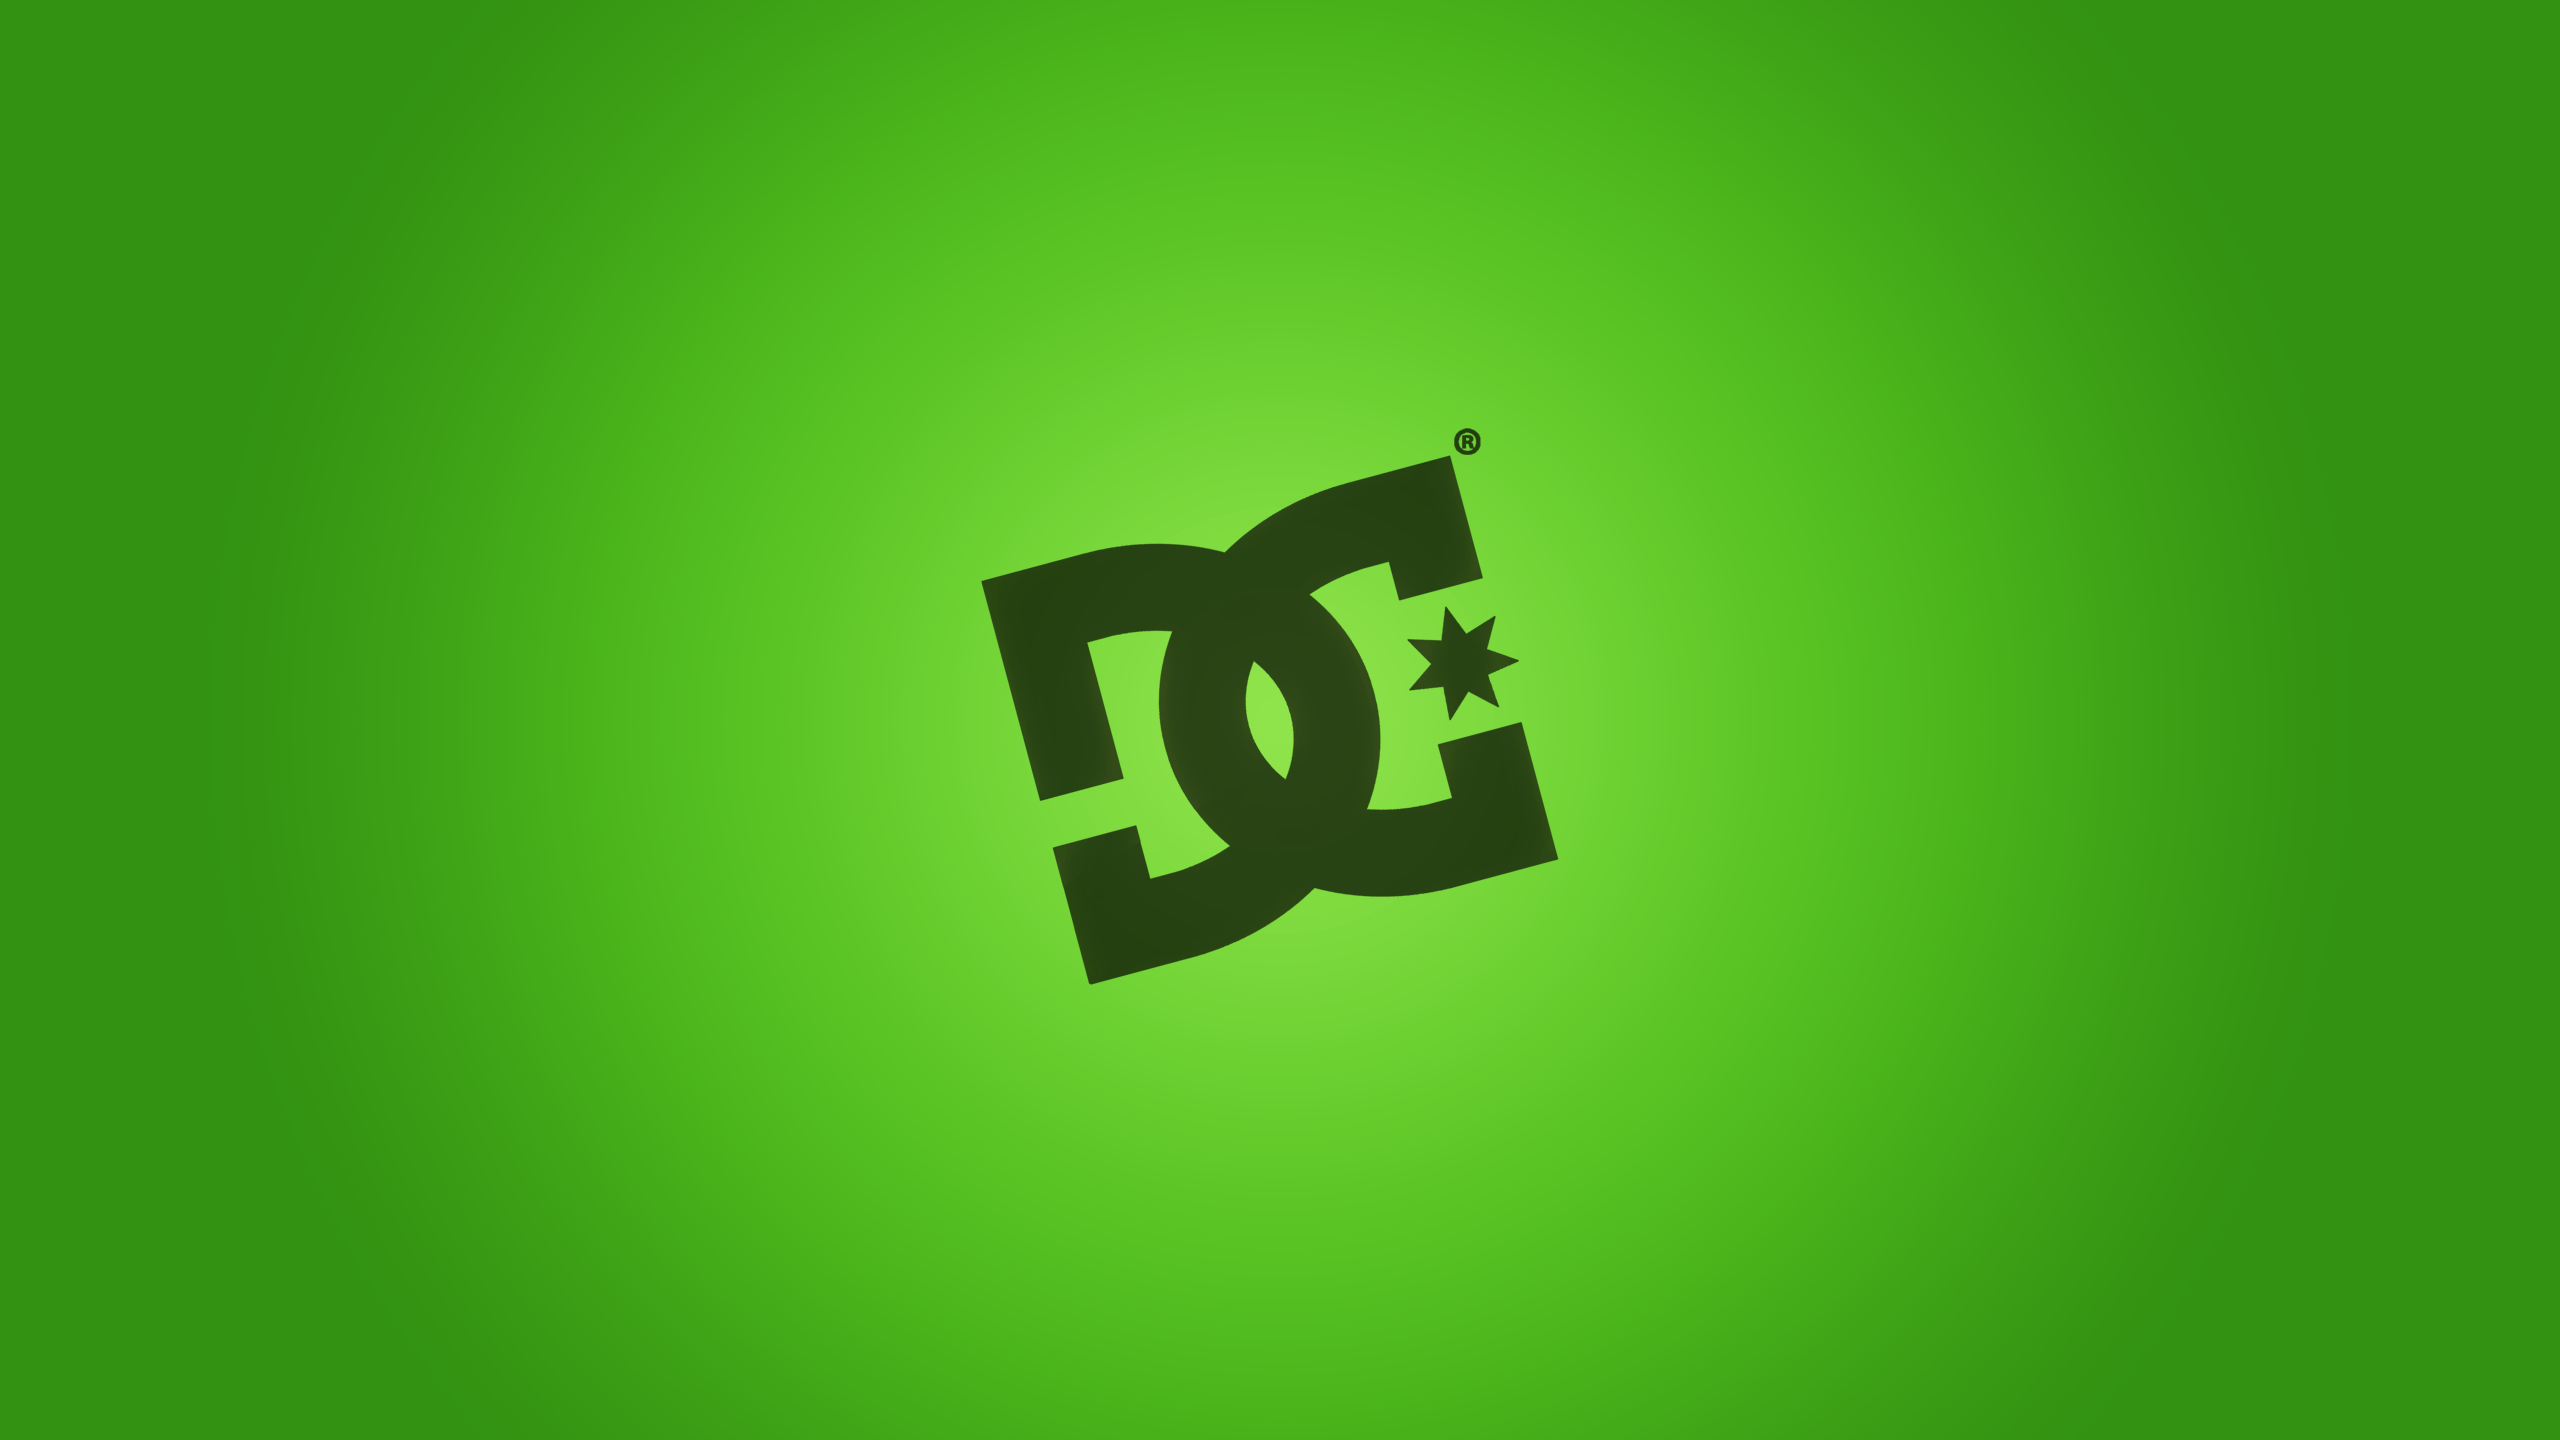 Dc Shoe Logo Wallpapers 2560x1440